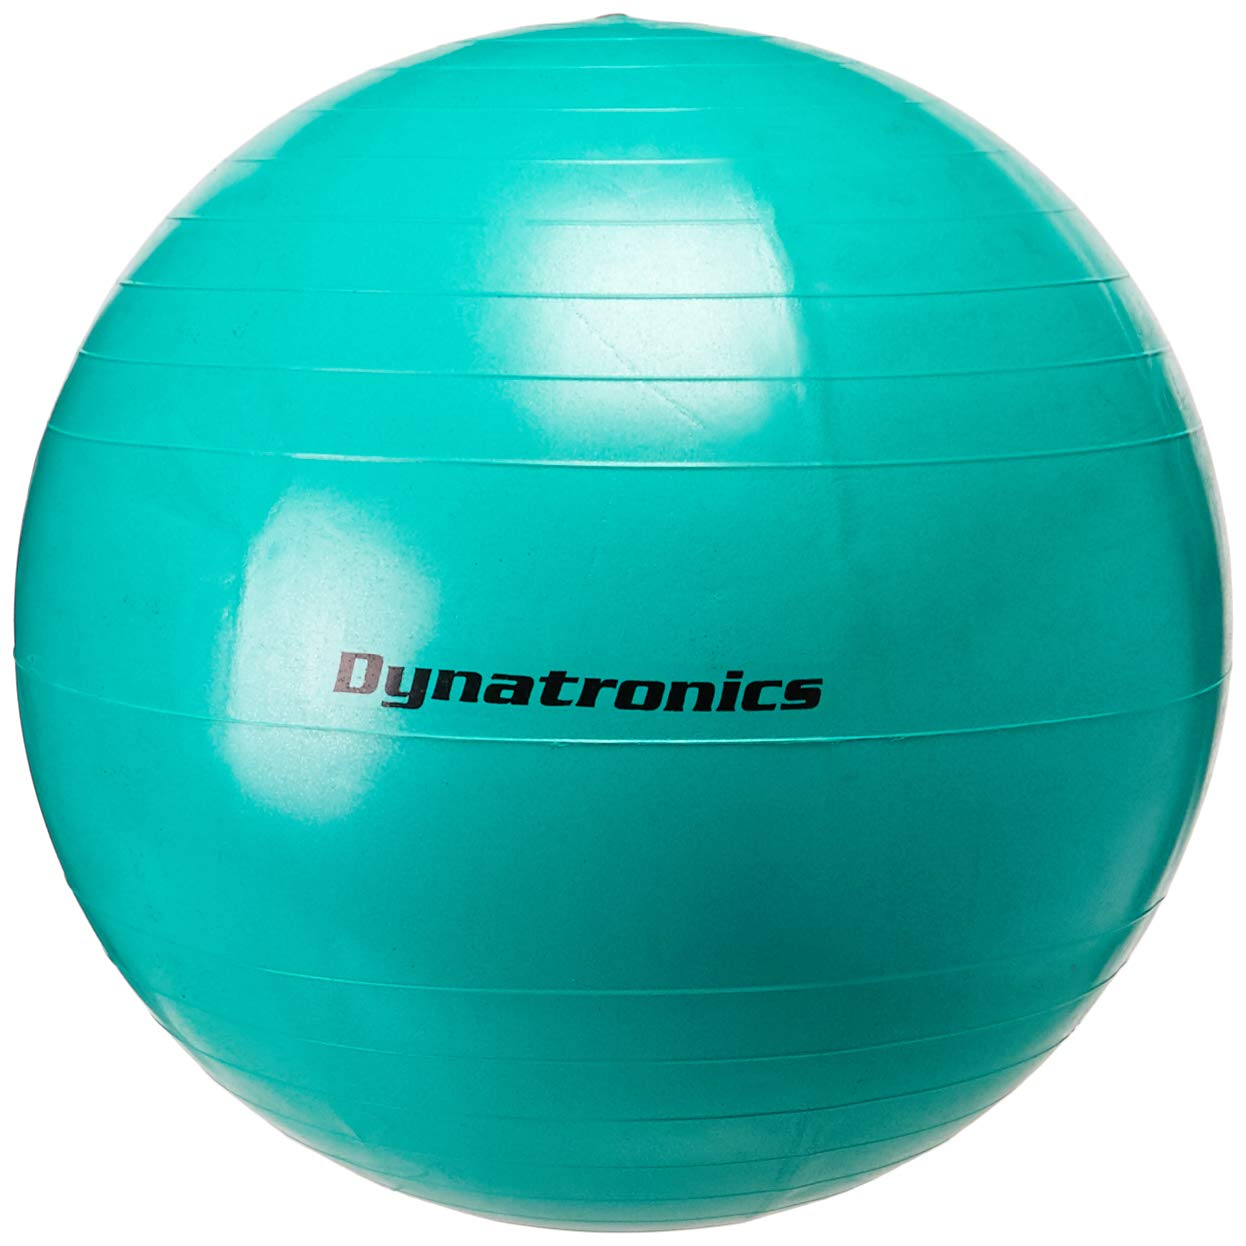 Complete Medical Dynatronics Burst Resistant Exercise Ball, Green, 65 cm